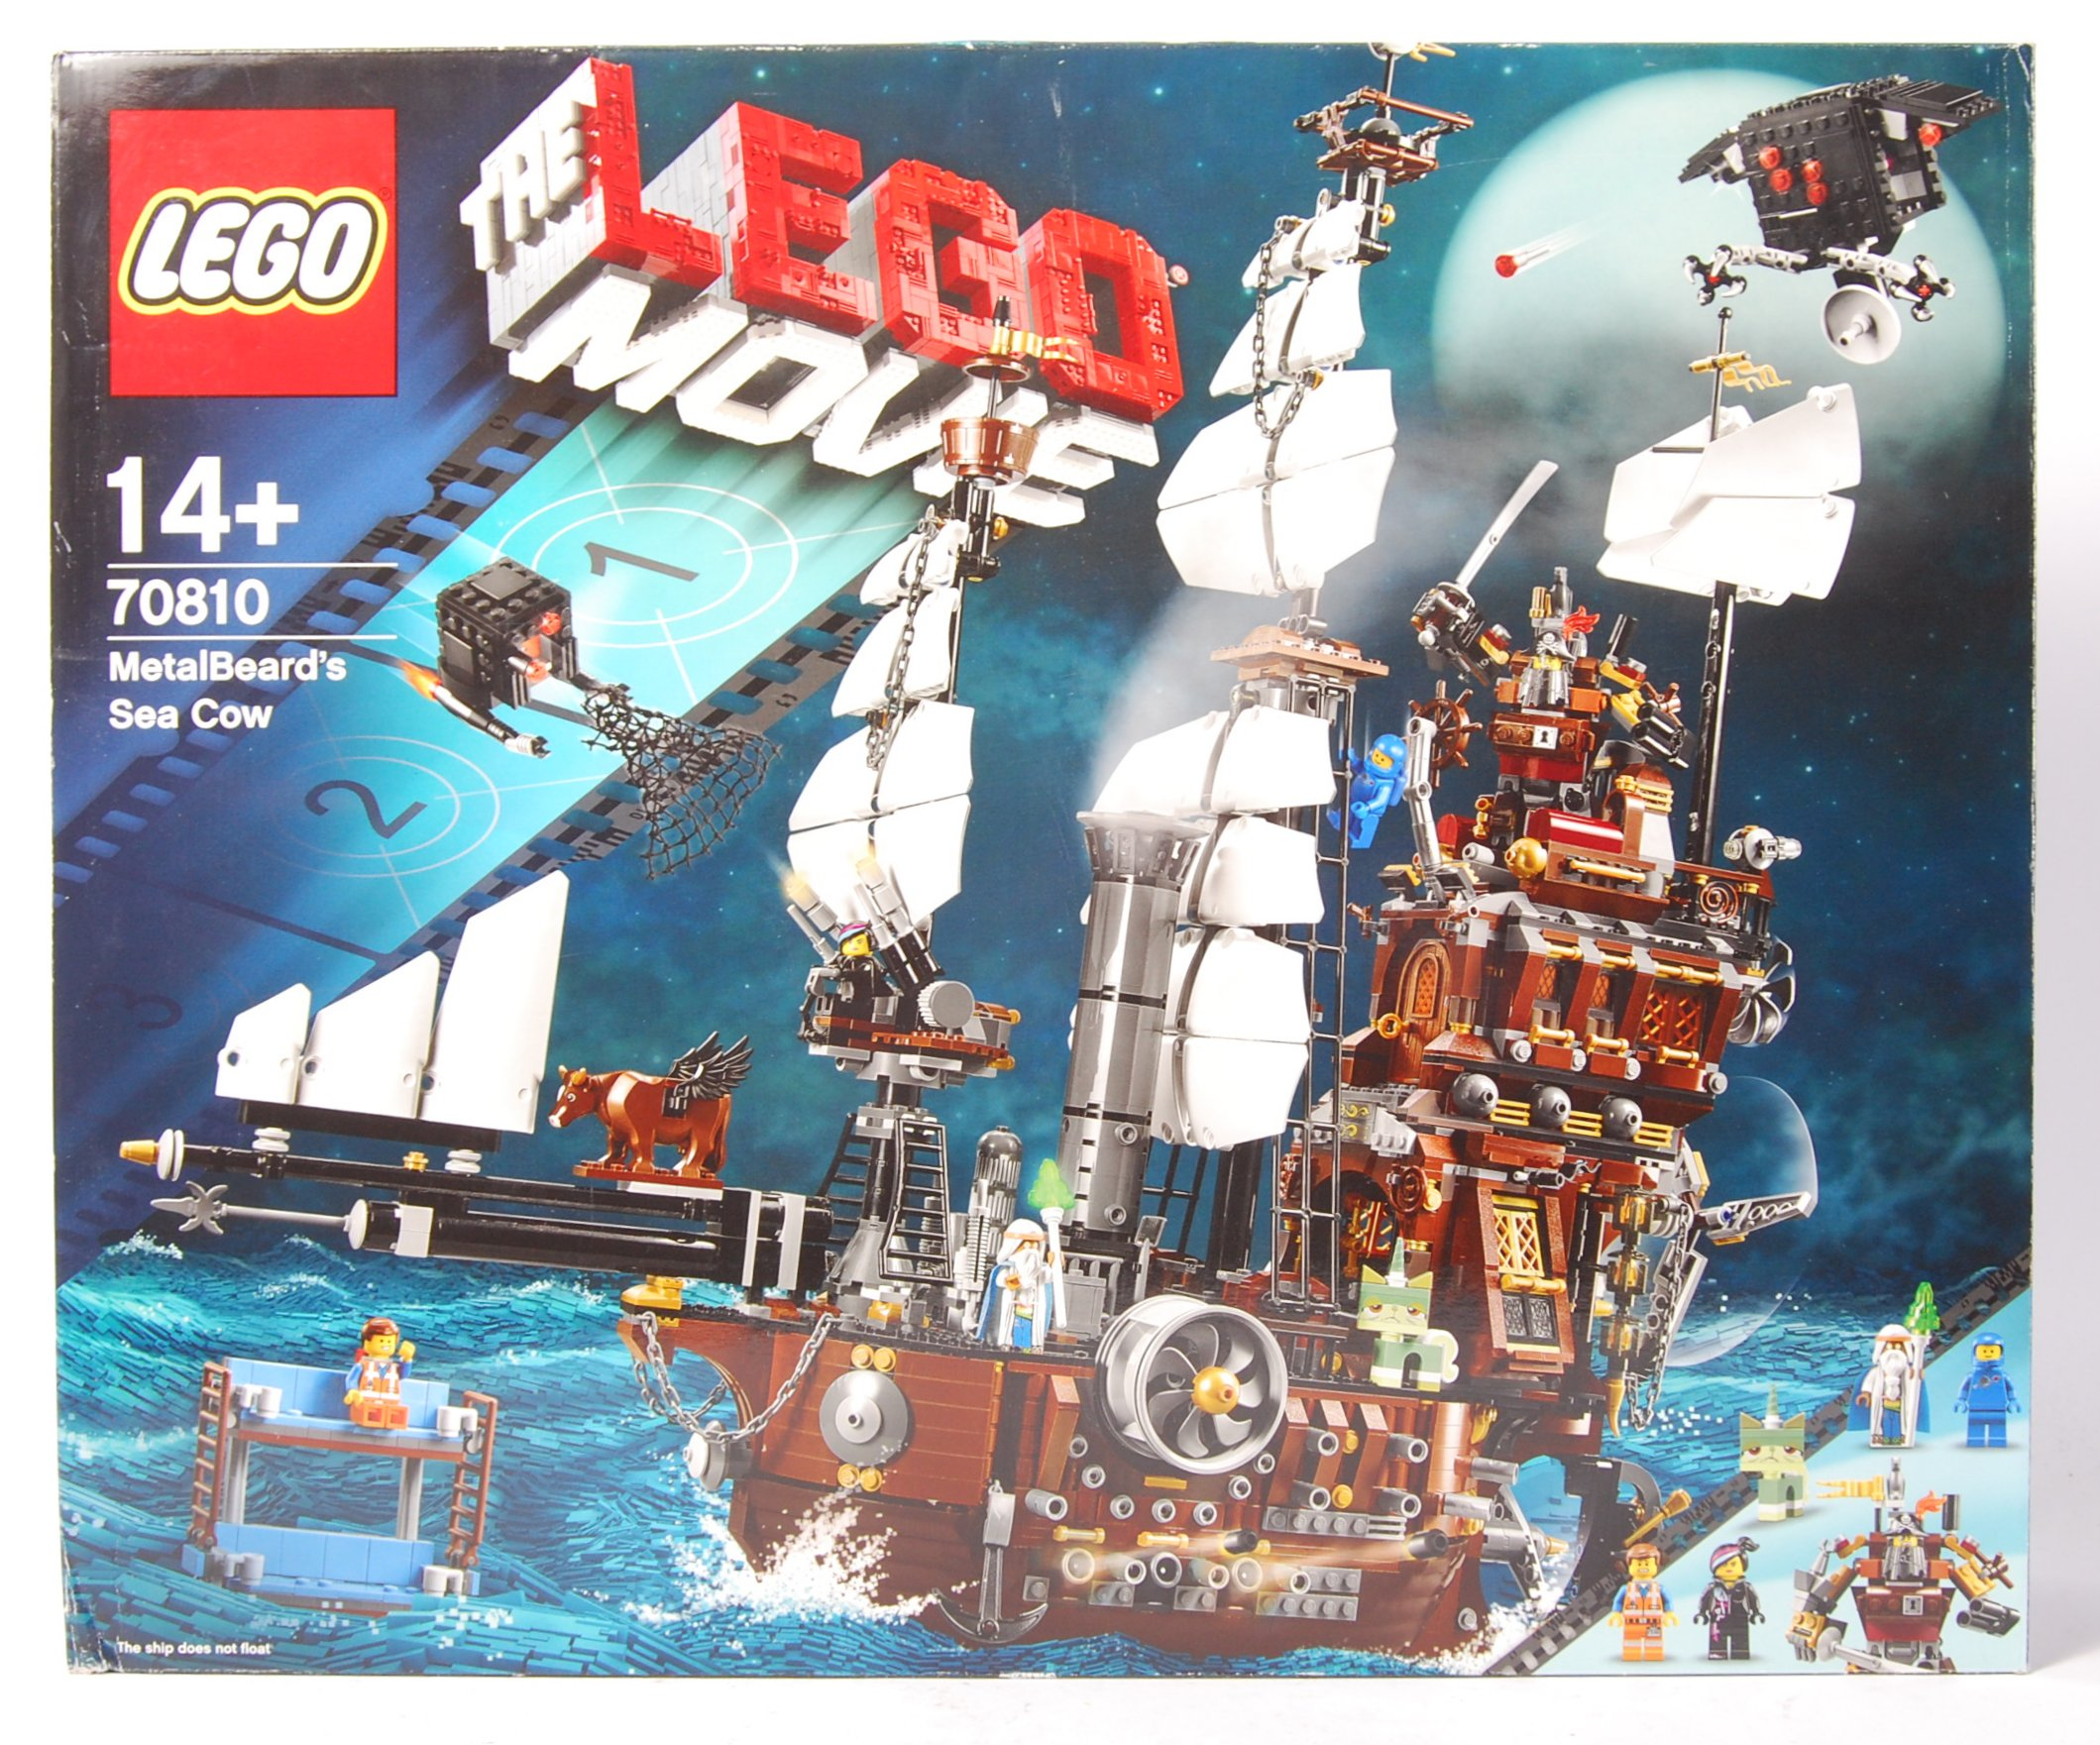 A The Lego Movie Set No 70810 Metalbeard S Sea Cow Vendor Assures Us Set Is 100 Comple